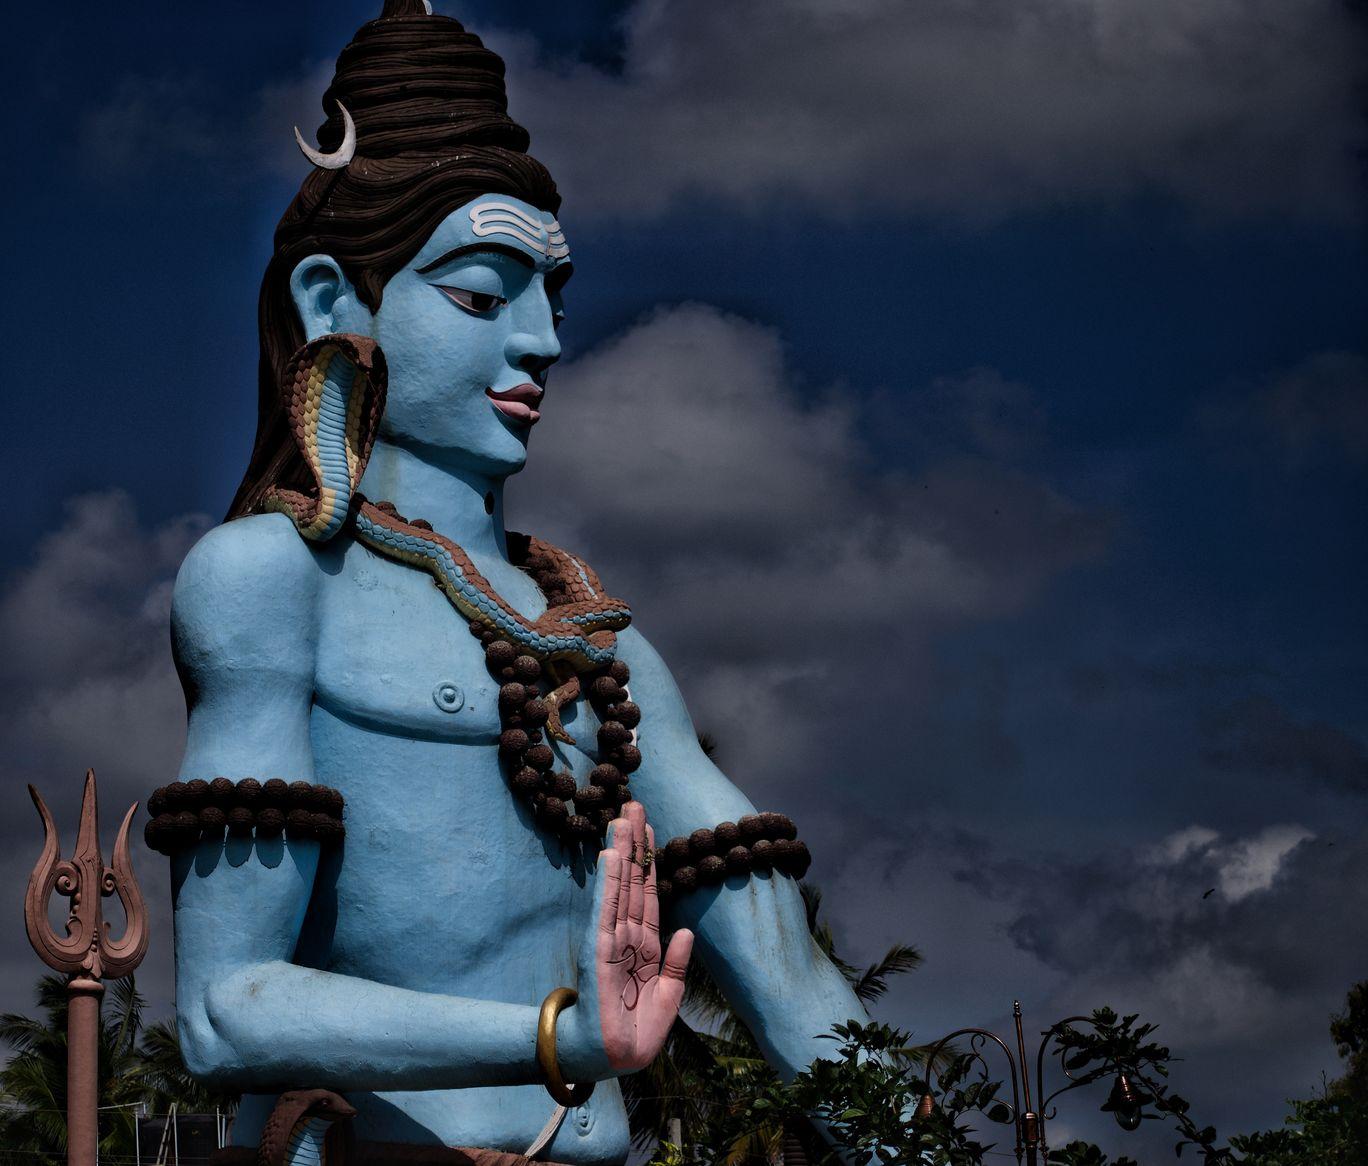 Photo of Nanjanagudu By Pooja Nag